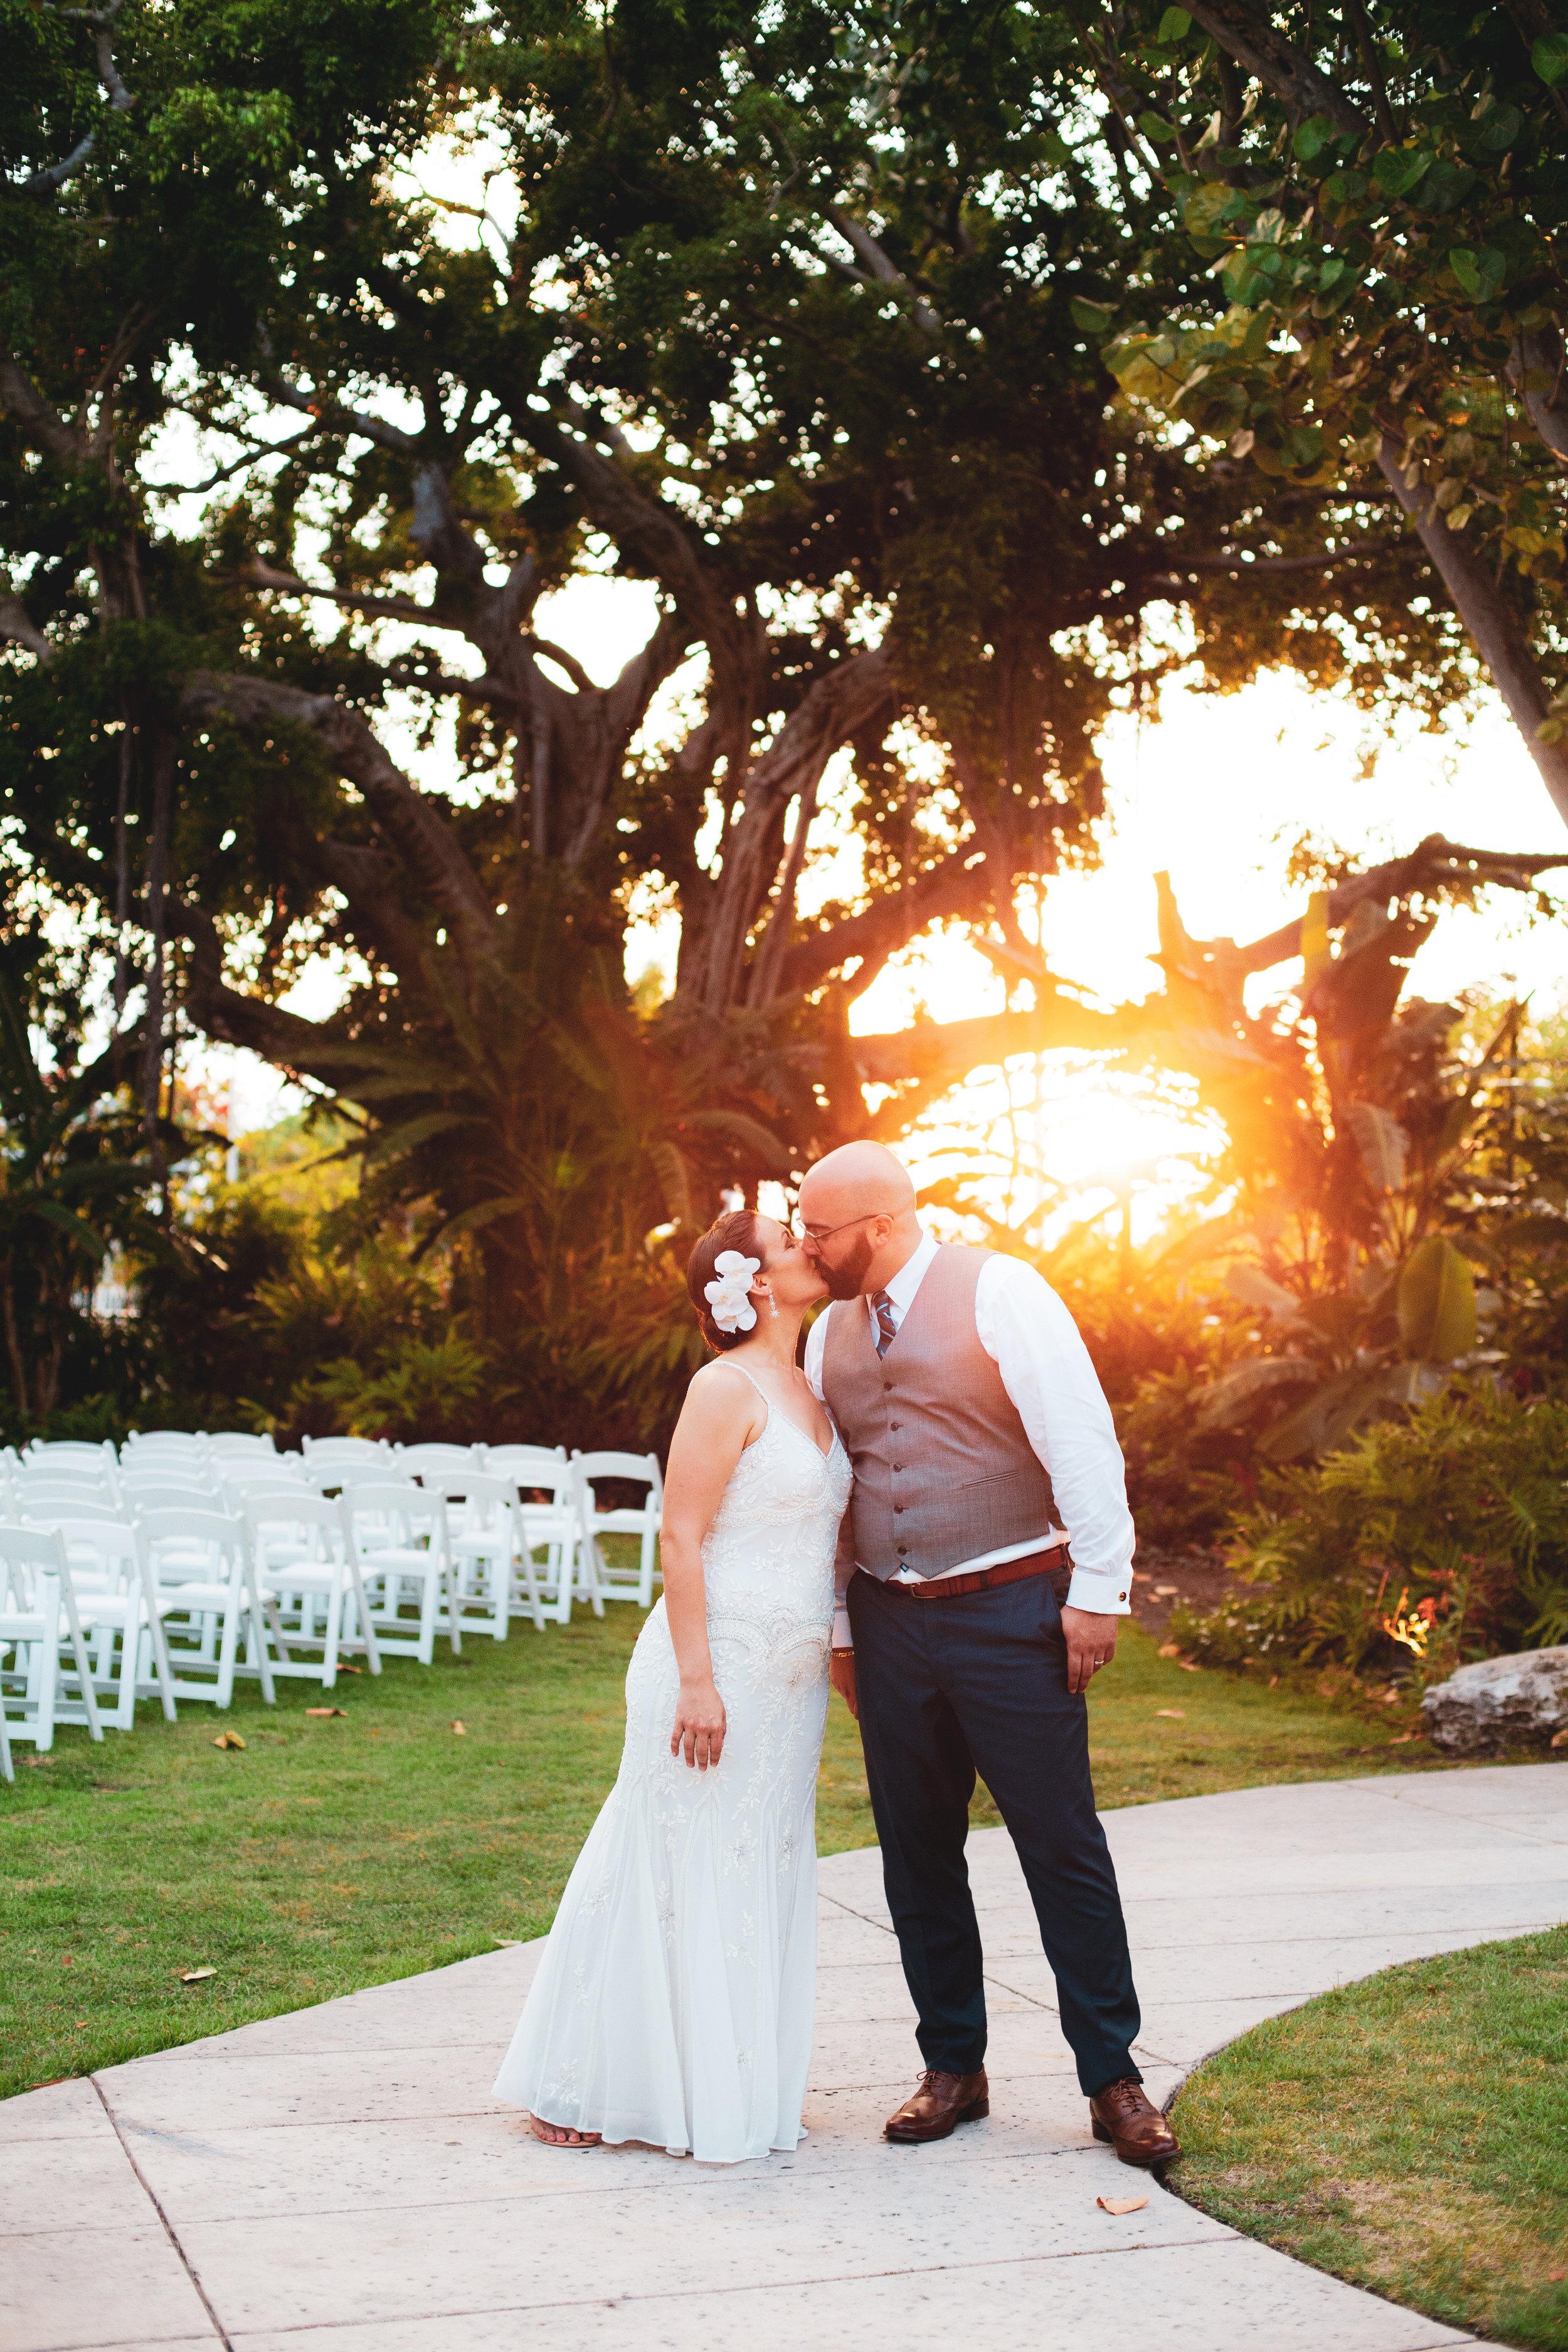 miami beach botanical garden florida wedding © kelilina photography 20190601135251-5.jpg